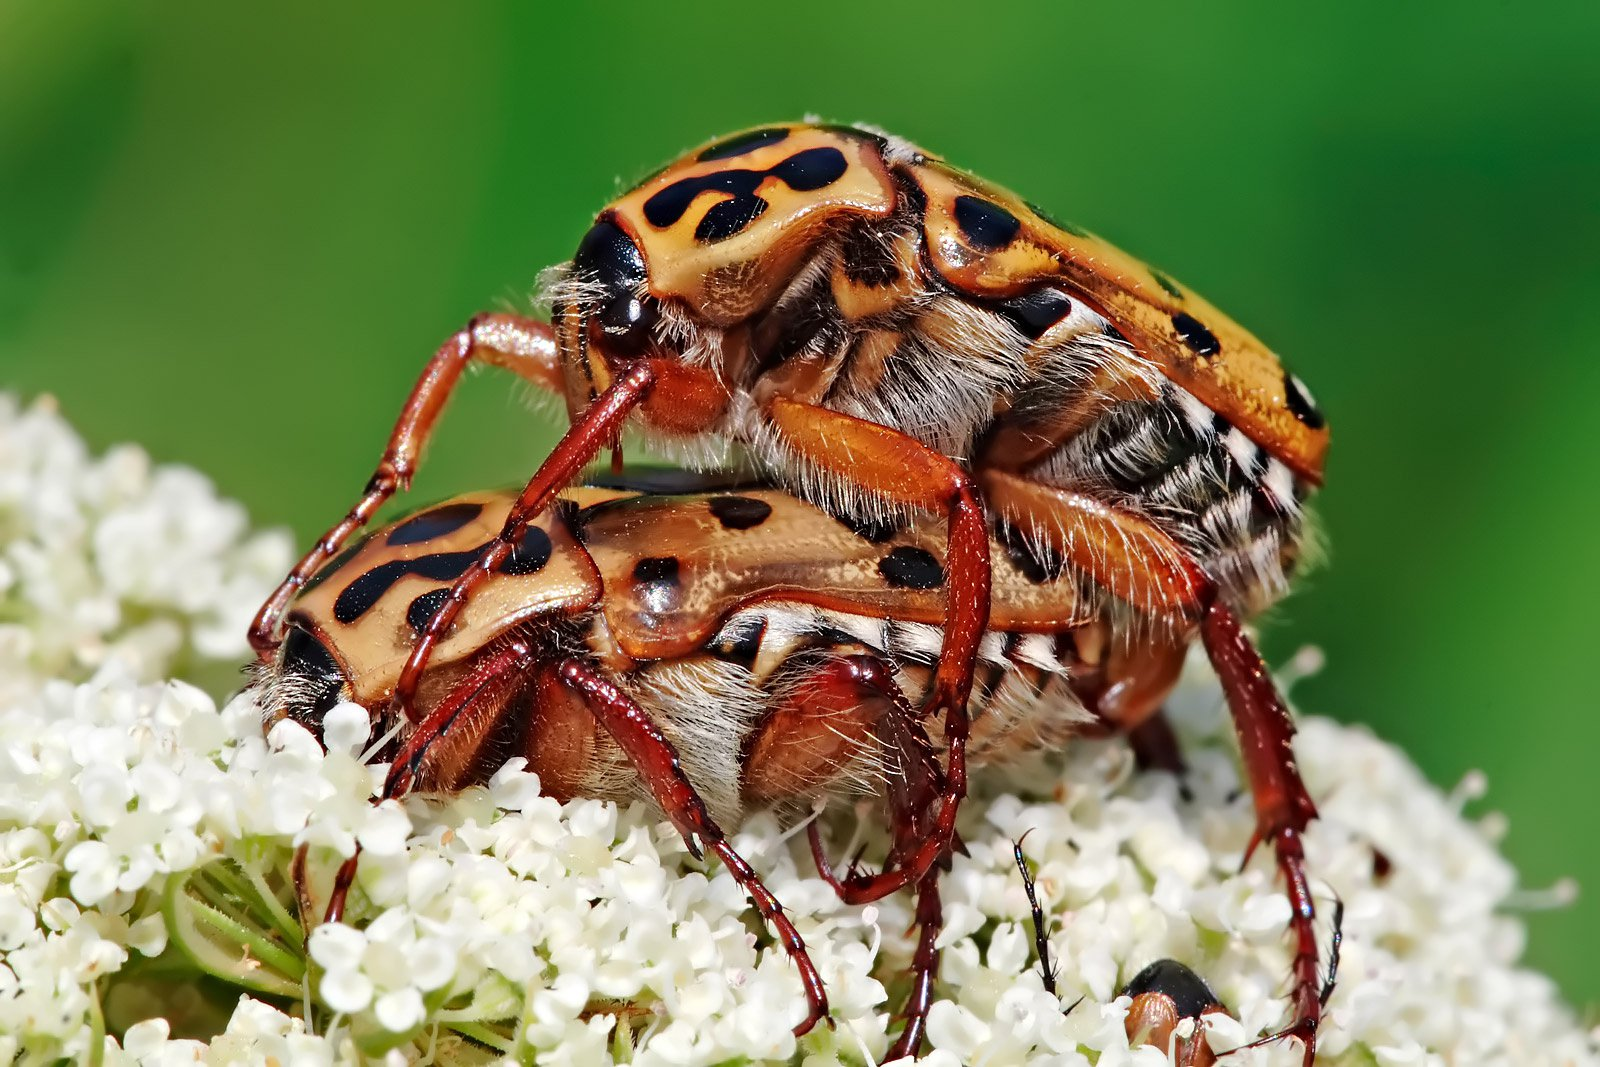 Spotted Flower Chafer, Polystigma punctata, Scarabaeidae